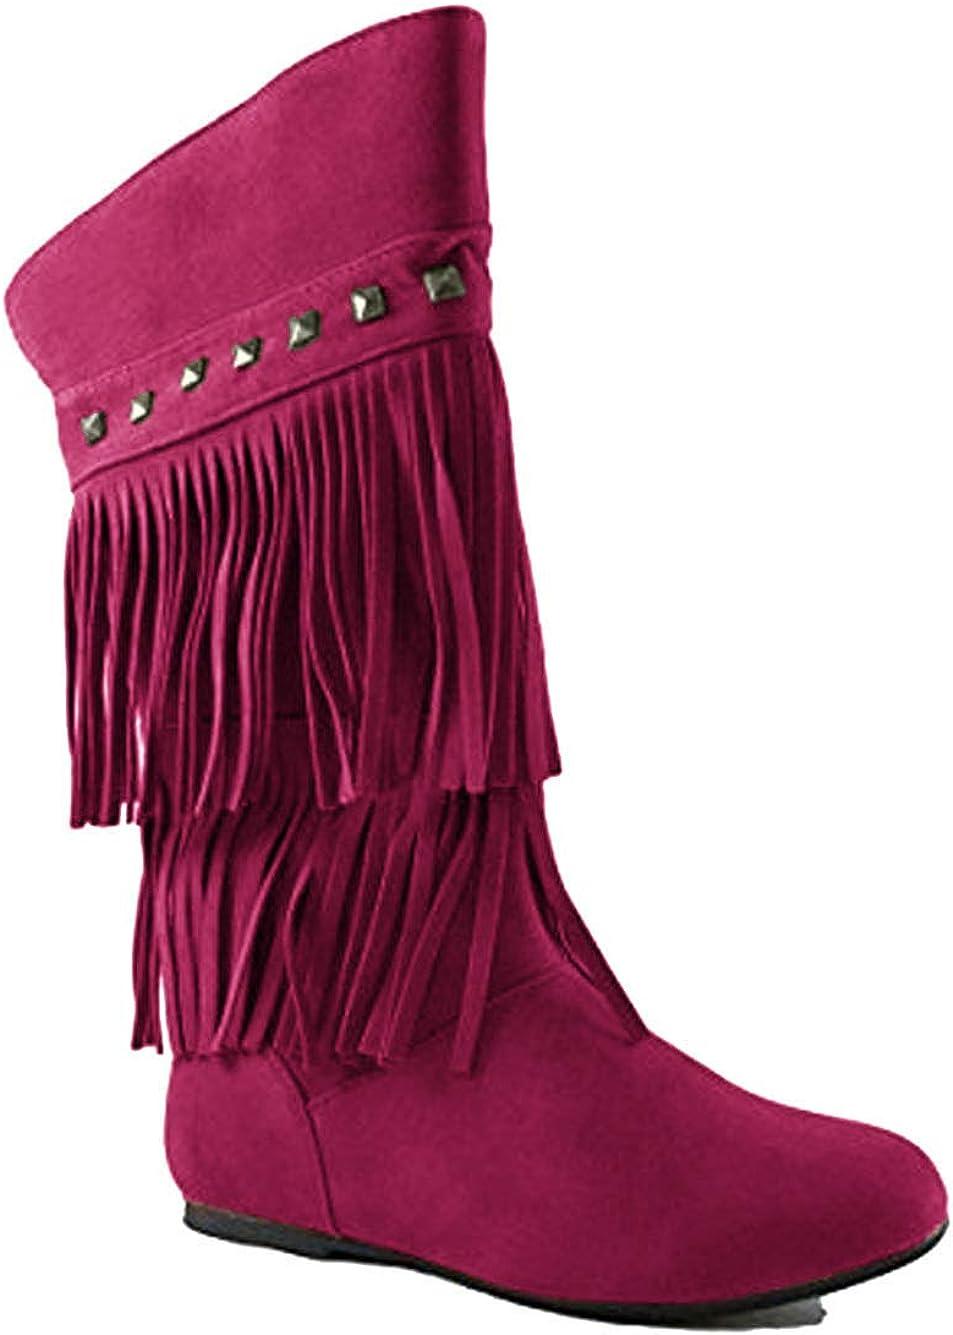 YOKI Trina 03K Little Girls Moccasin 2 Layer Fringe Boots